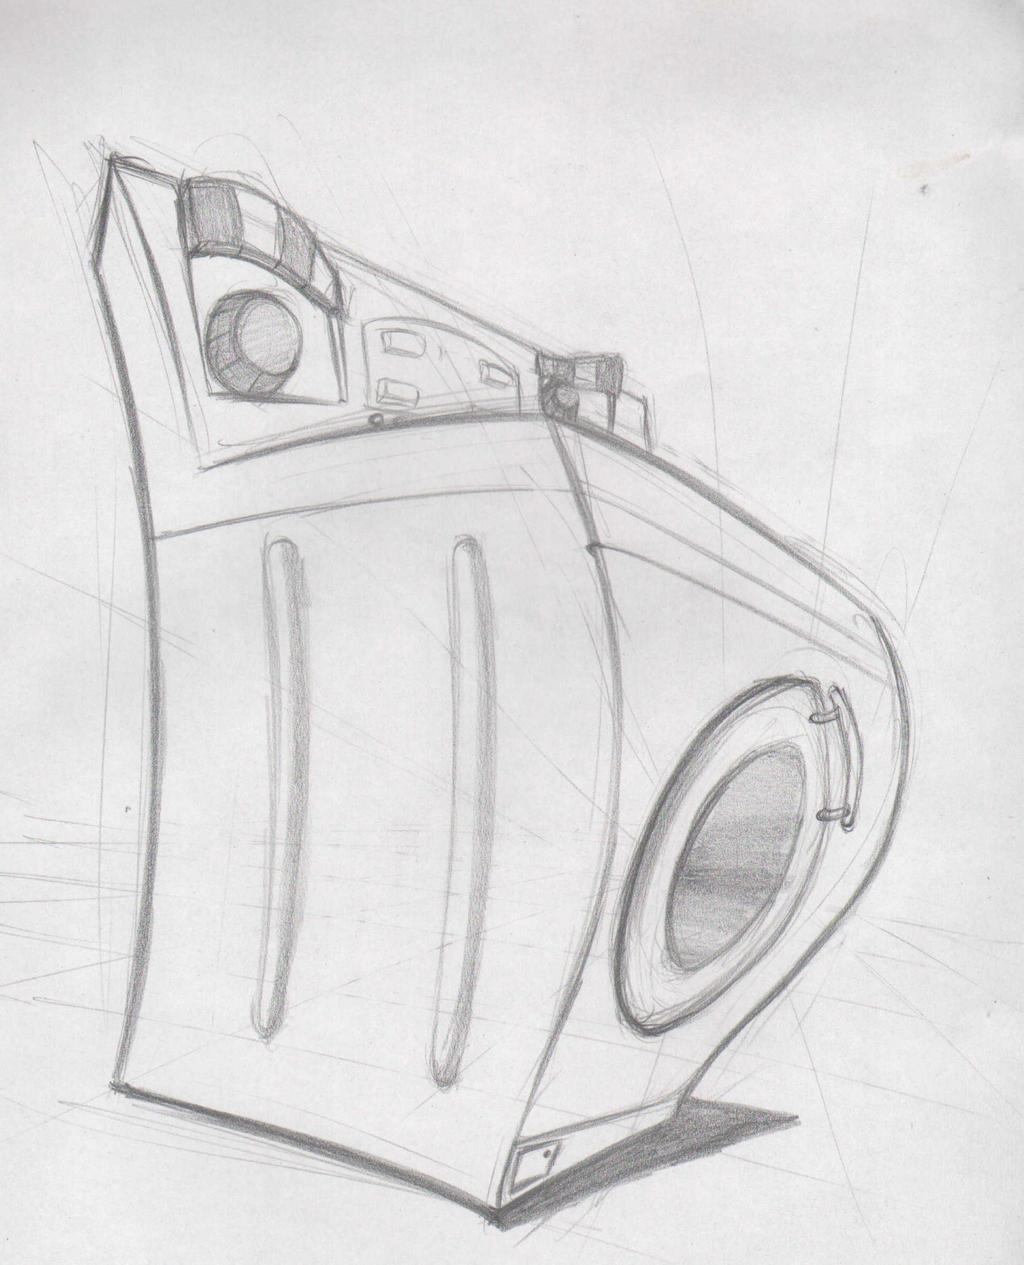 Washing Machine Drawing ~ Comiccon sketch the washing machine by mokuu on deviantart